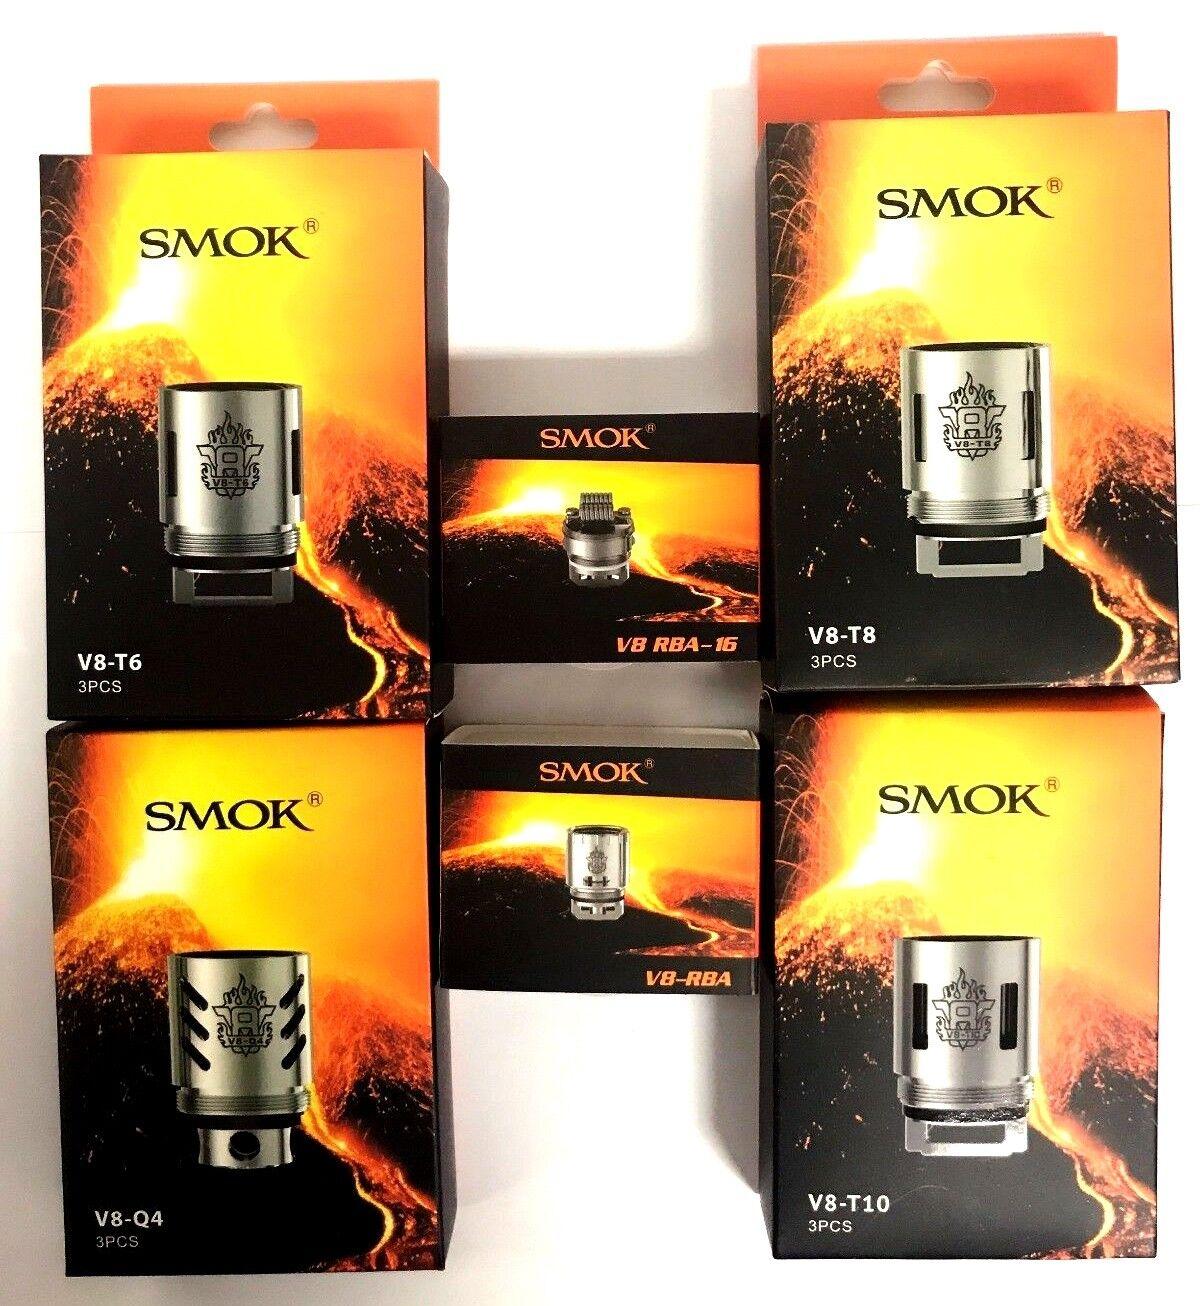 Authentic SMOK TFV8 V8-Q4|T6|T8|T10|RBA|RBA16 Coil U.S. Seller